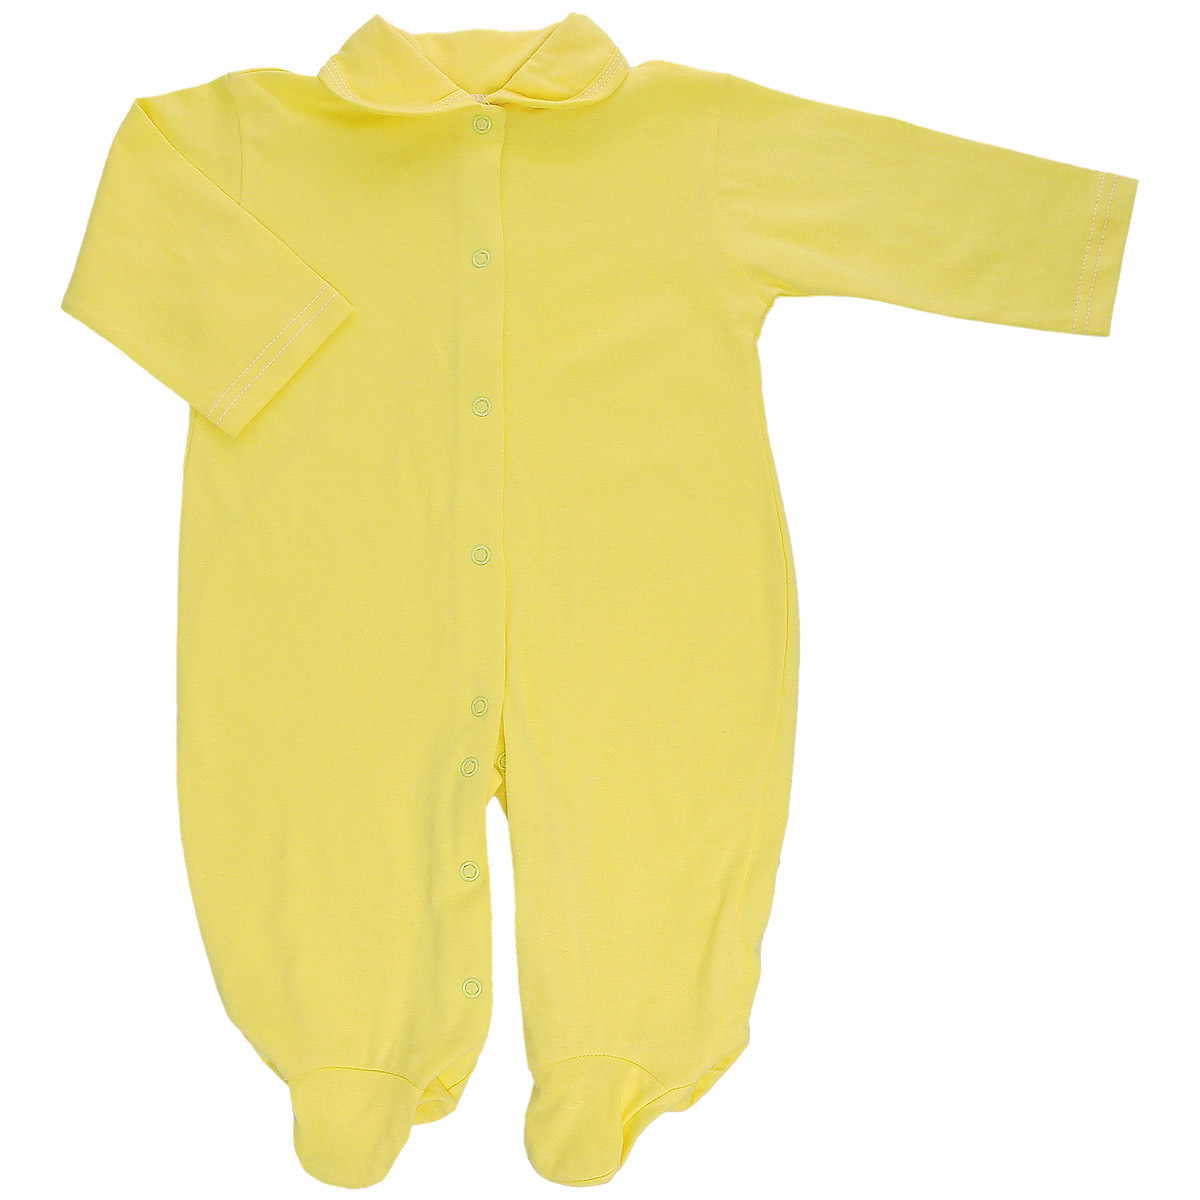 Комбинезон детский Трон-Плюс, цвет: желтый. 5805. Размер 62, 3 месяца